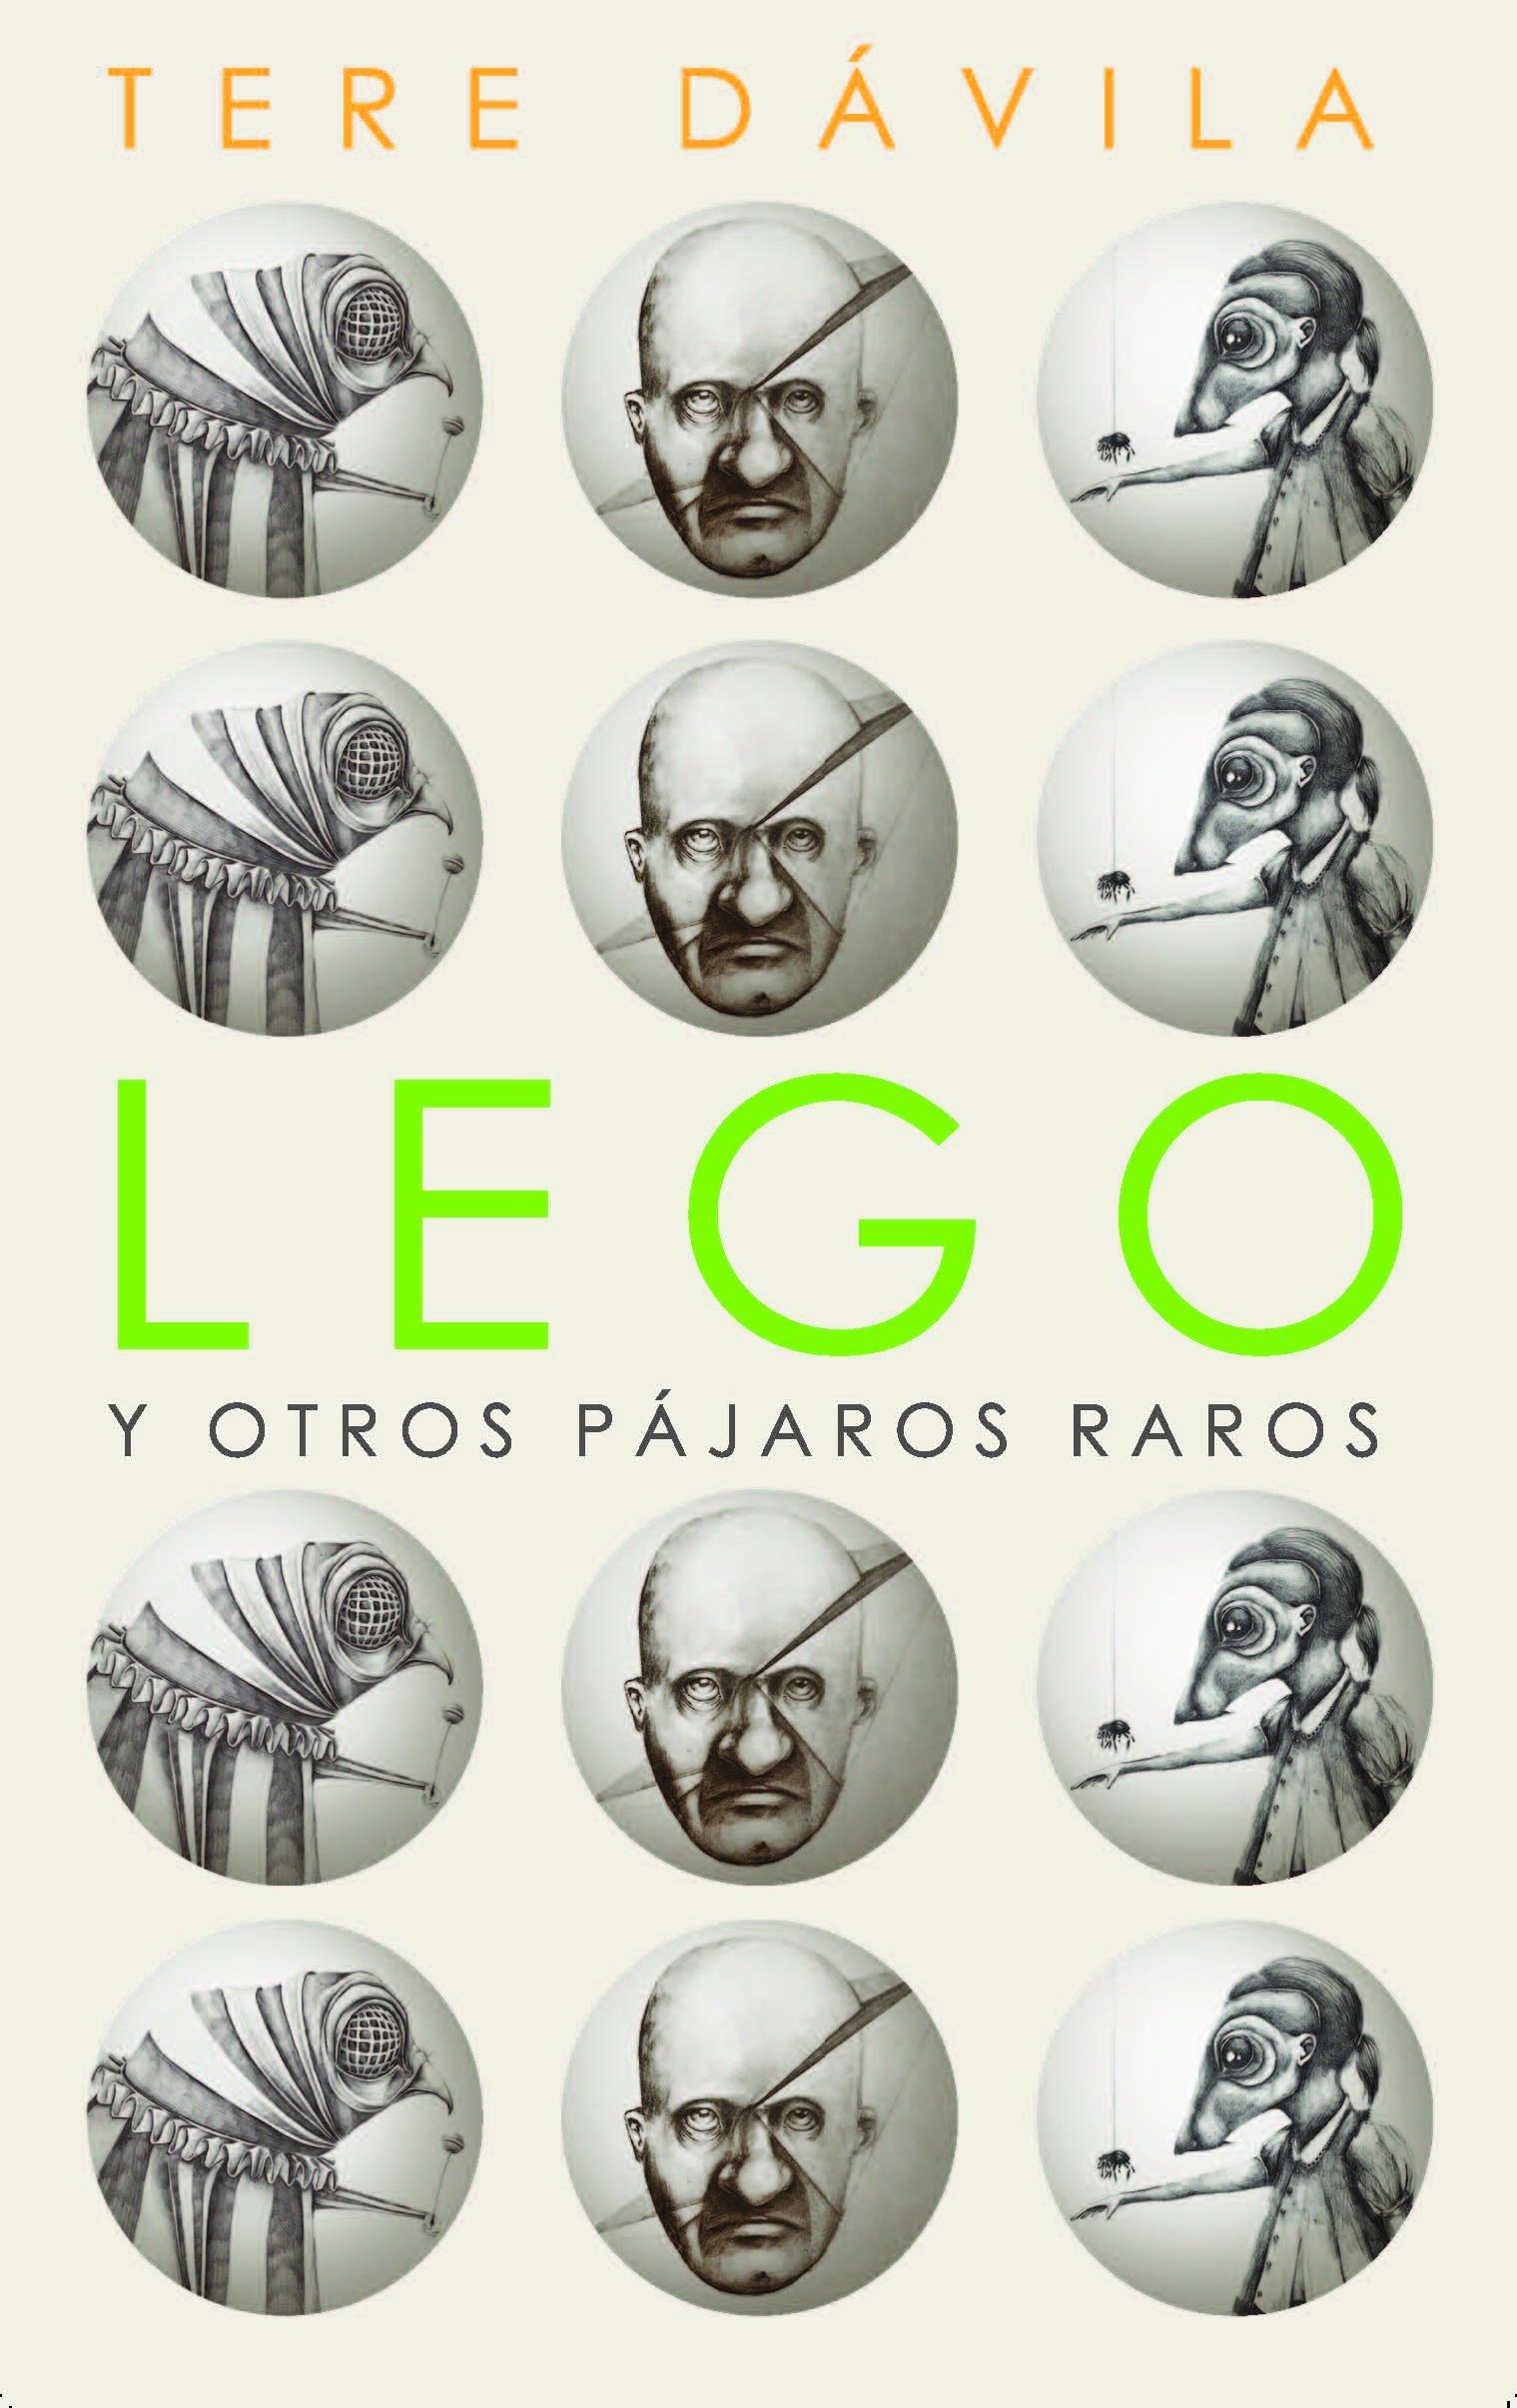 Lego y otros pájaros raros: Tere Dávila: 9789945581102: Amazon.com: Books